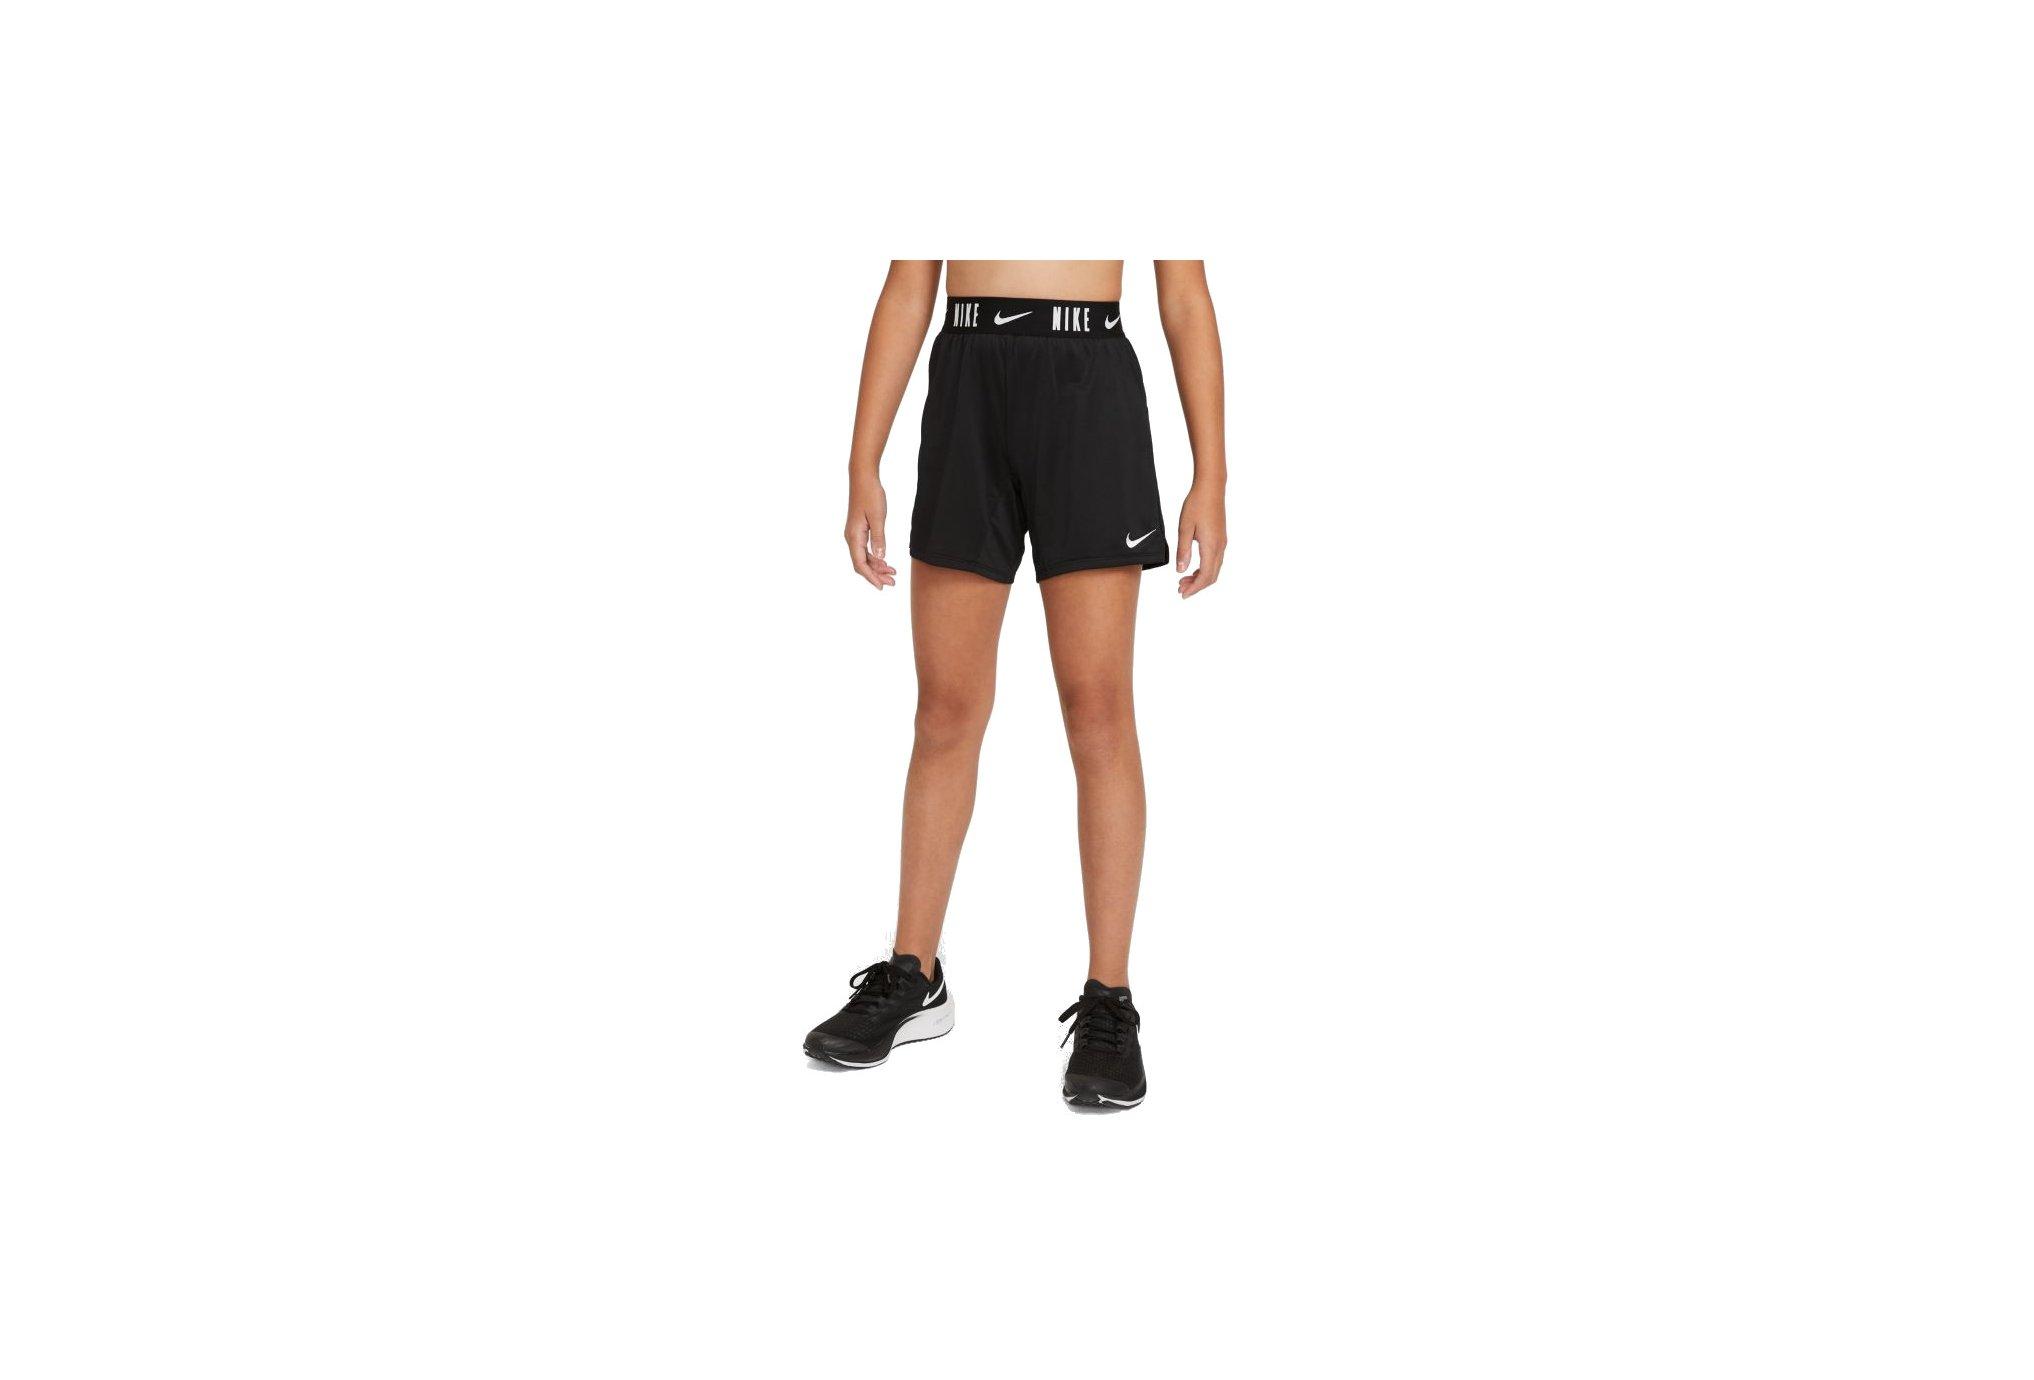 Nike Dri-Fit Trophy Fille vêtement running femme